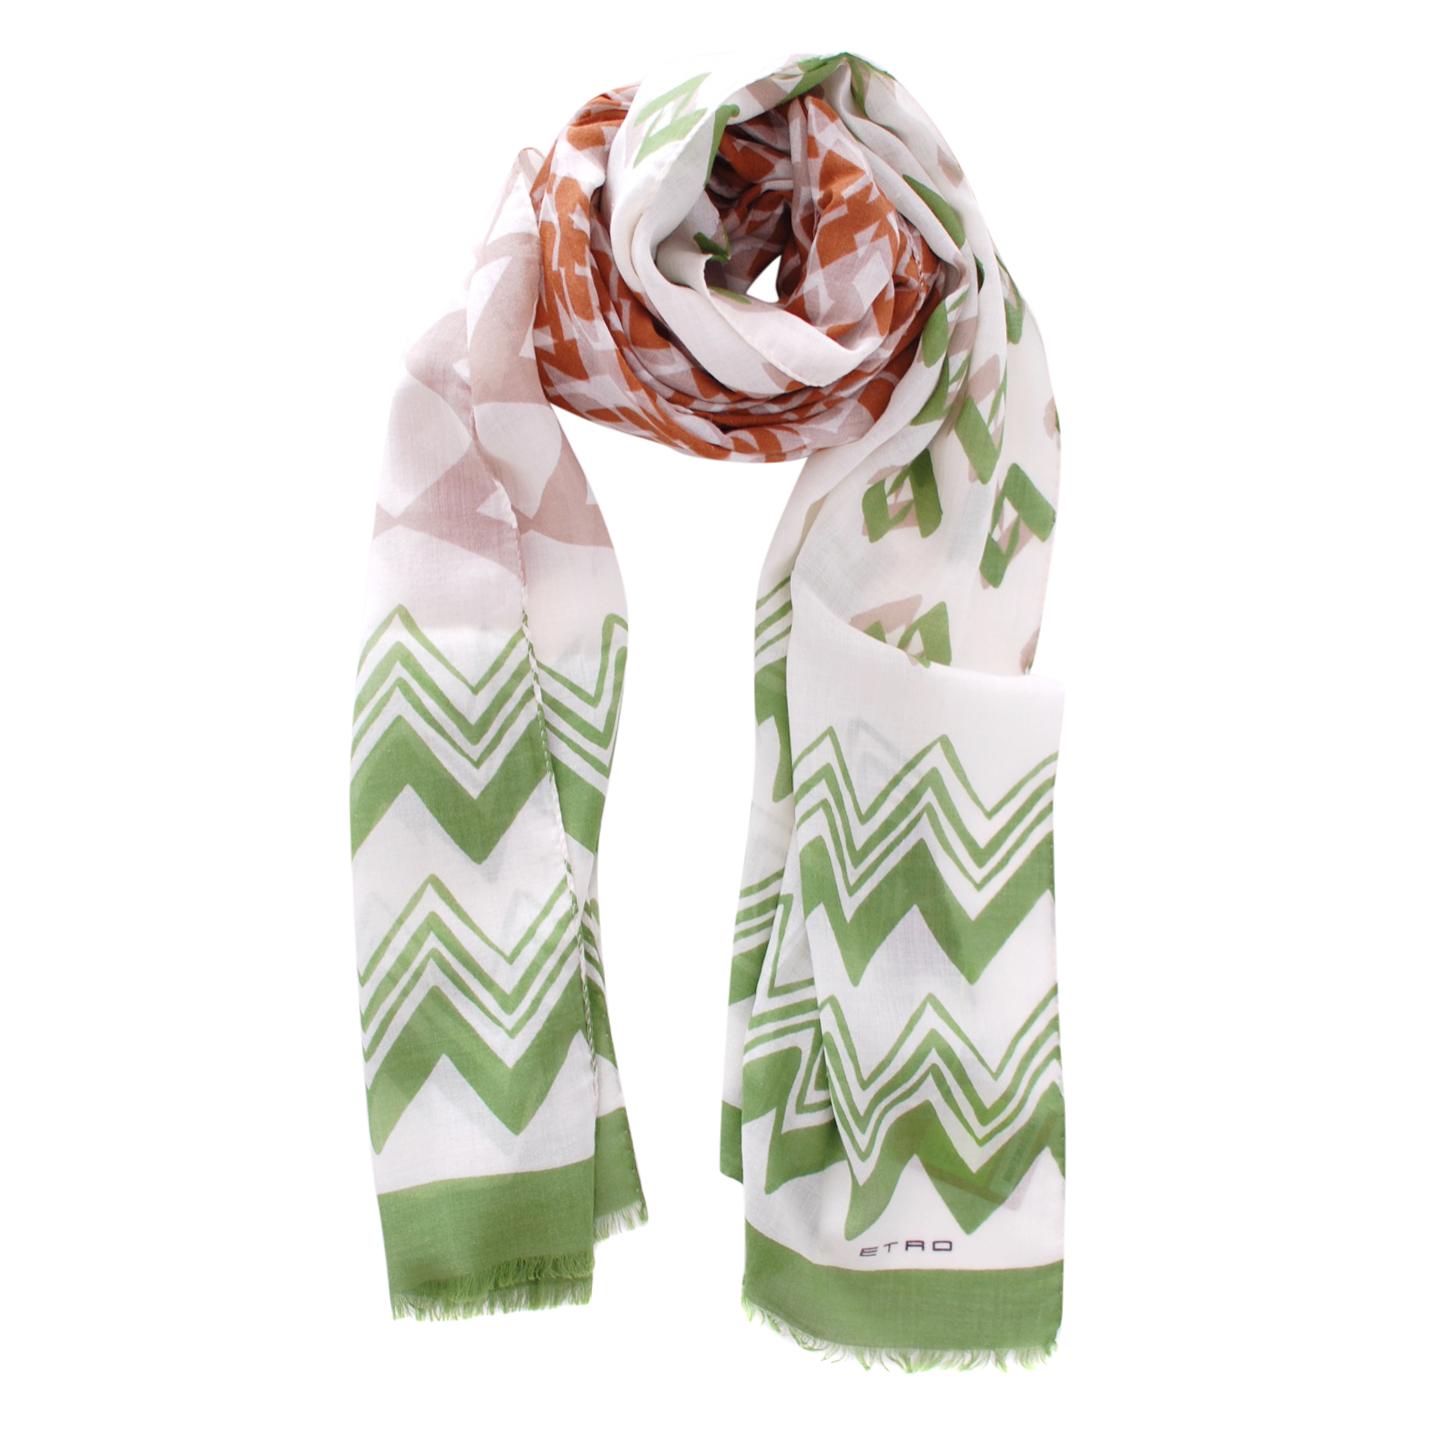 Etro Geometric Print Wool & Silk Shawl